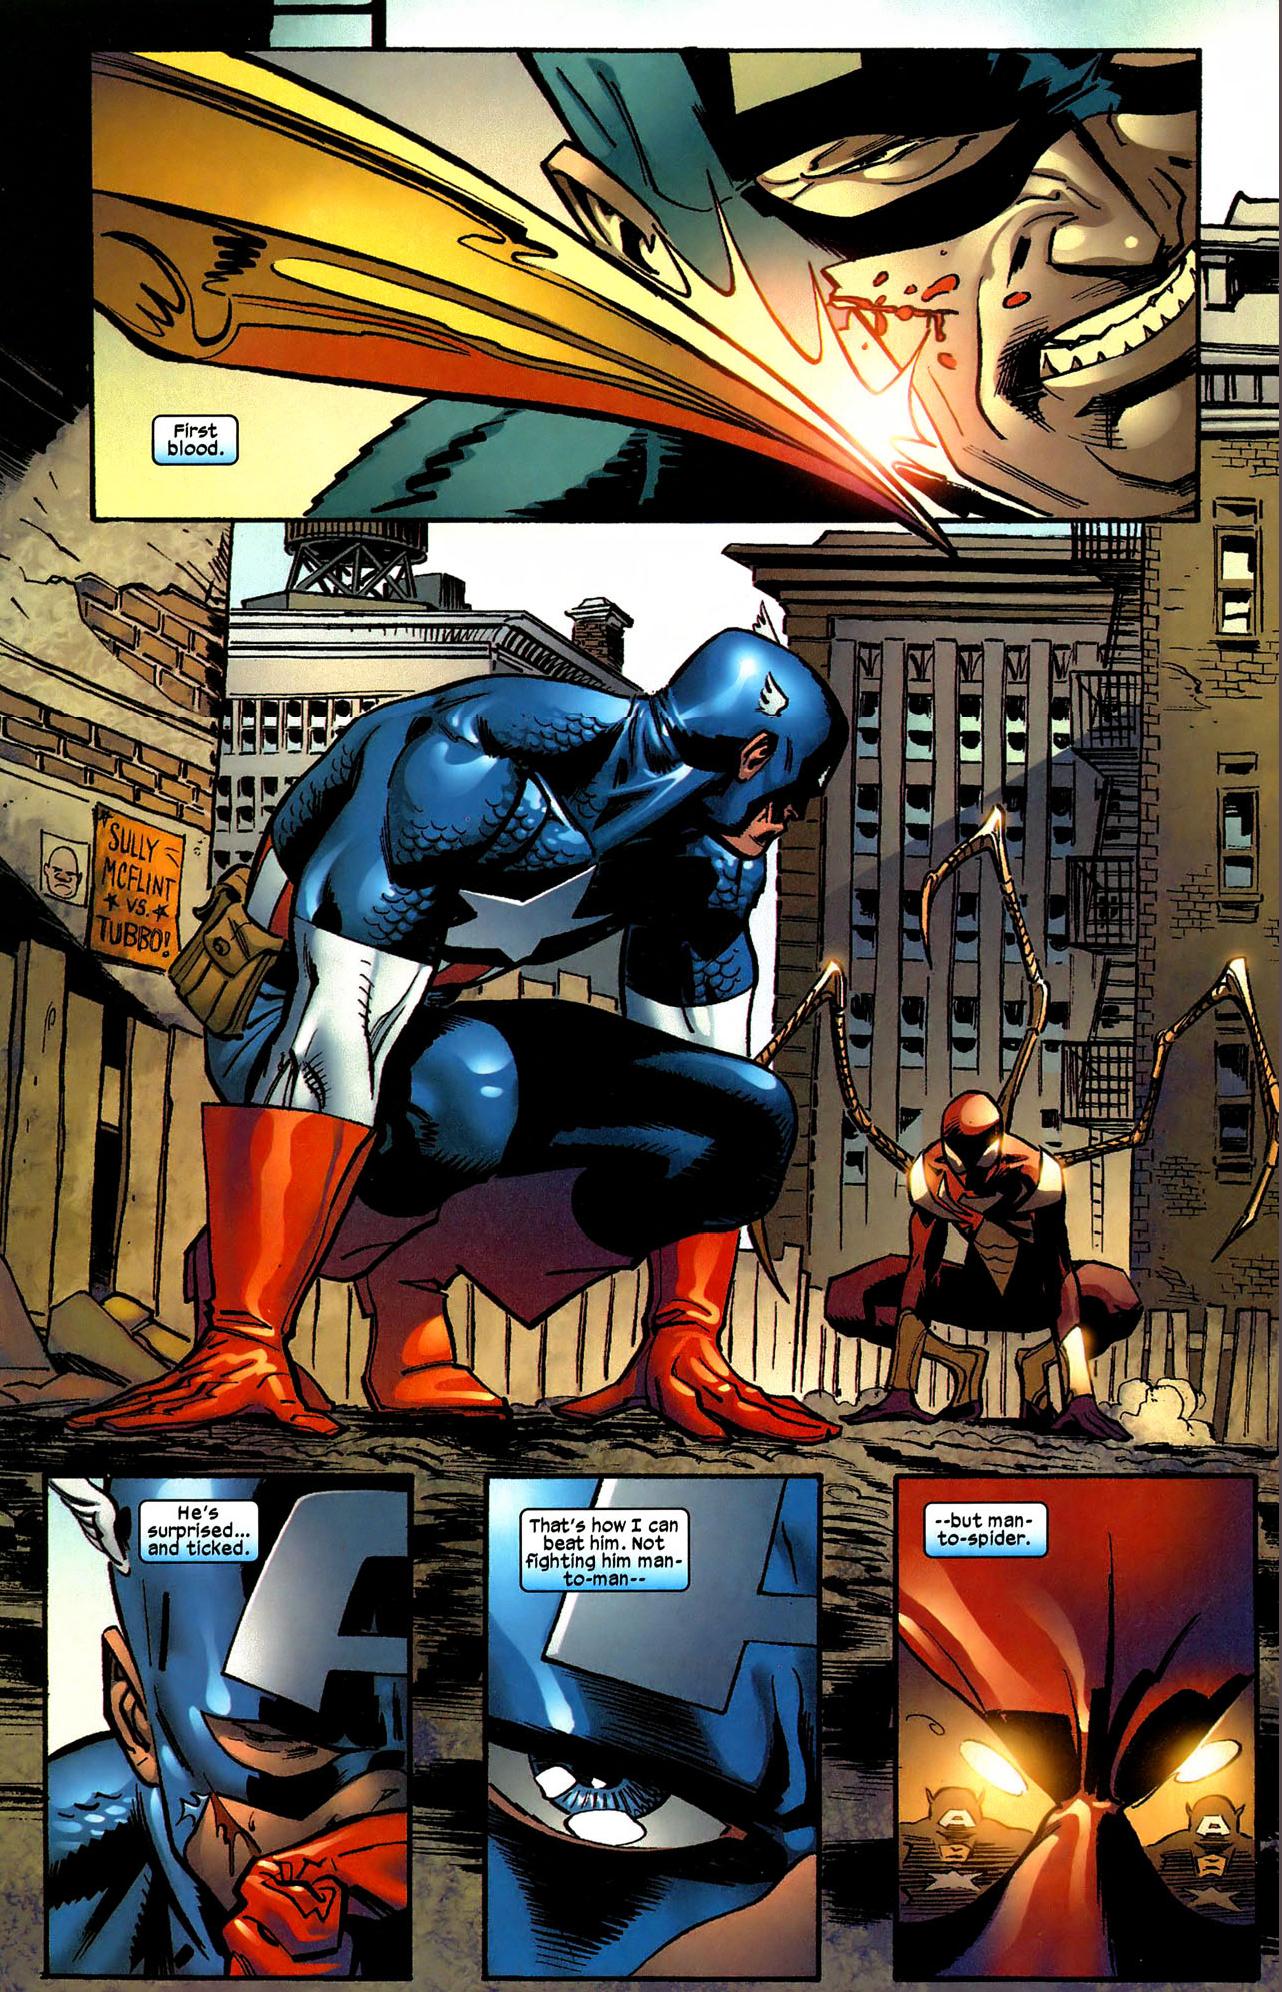 Spider-Man VS Captain America (Civil War) – Comicnewbies